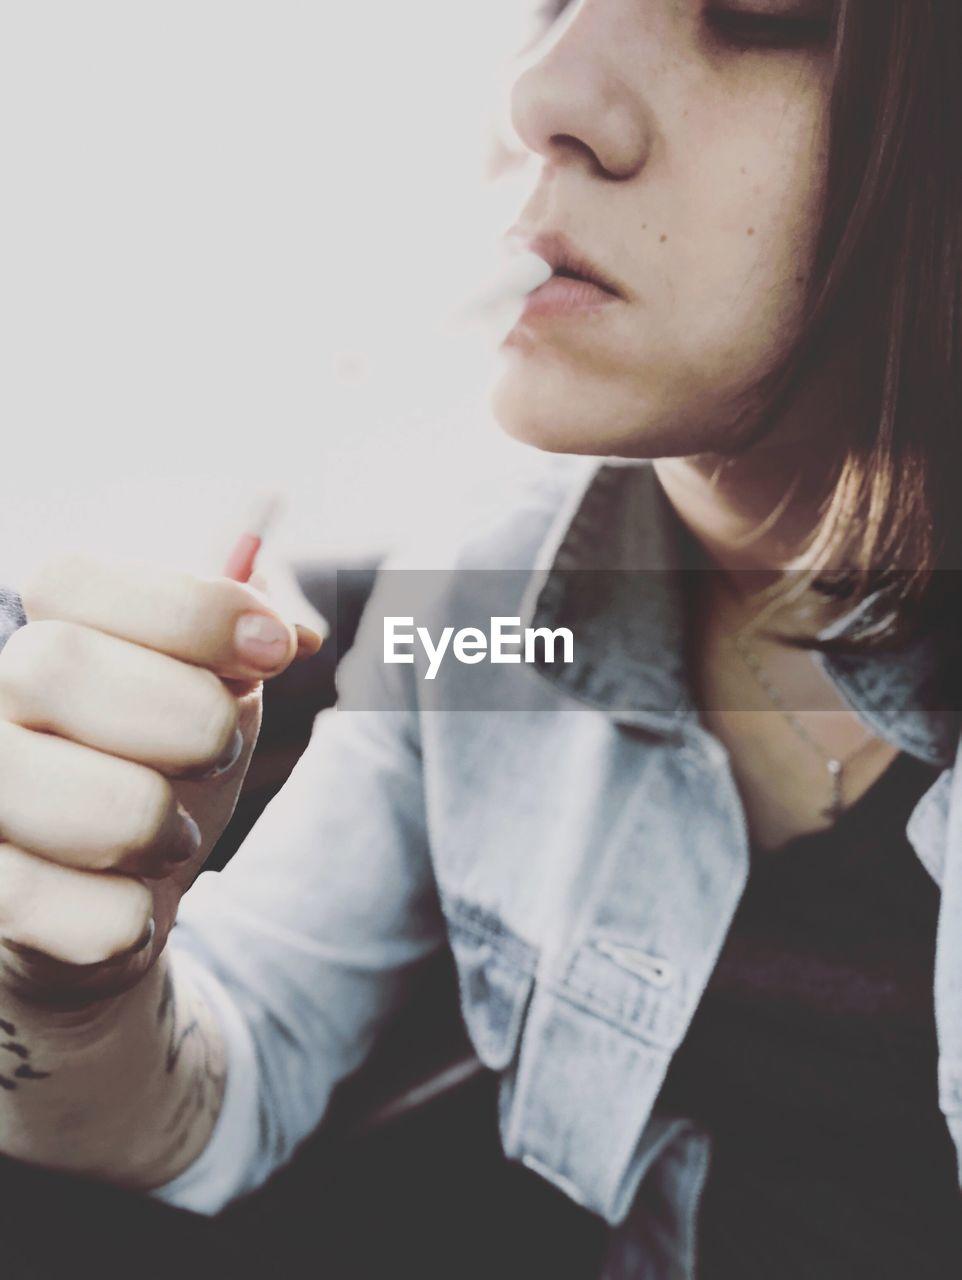 Close-Up Of Woman Smoking Electronic Cigarette